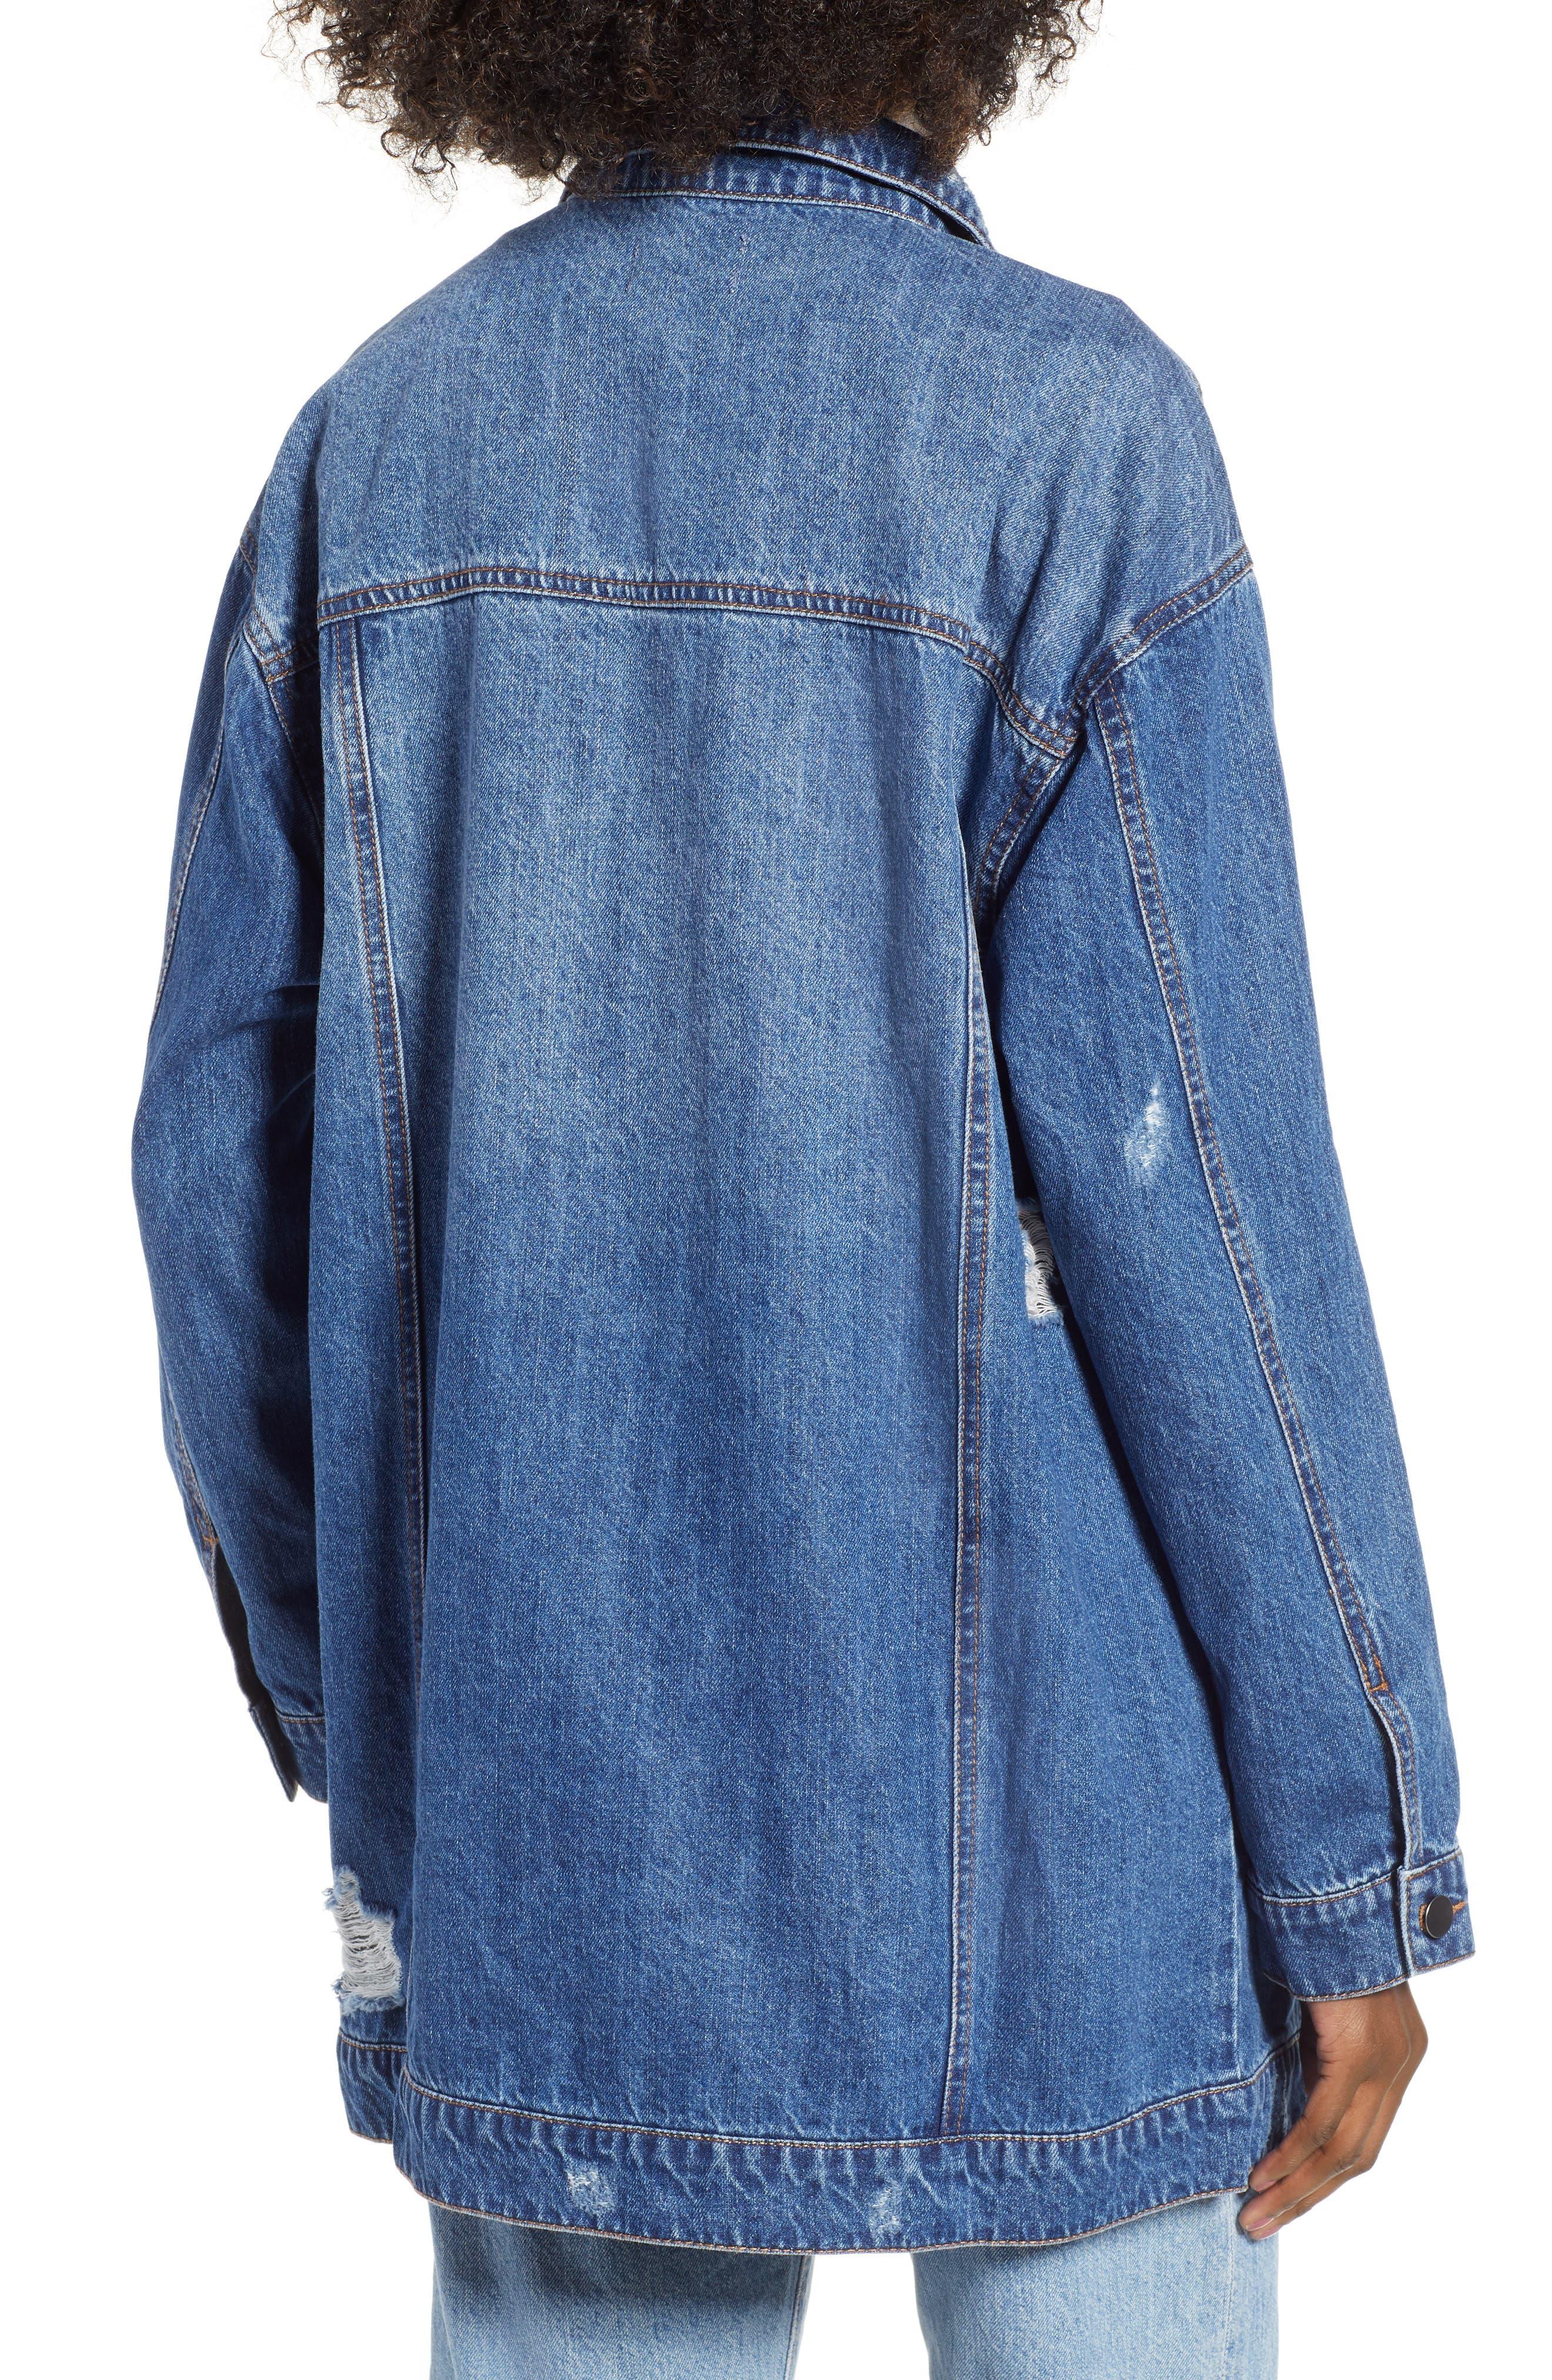 Distressed Longline Denim Jacket,                             Alternate thumbnail 2, color,                             ADVENTURA WASH